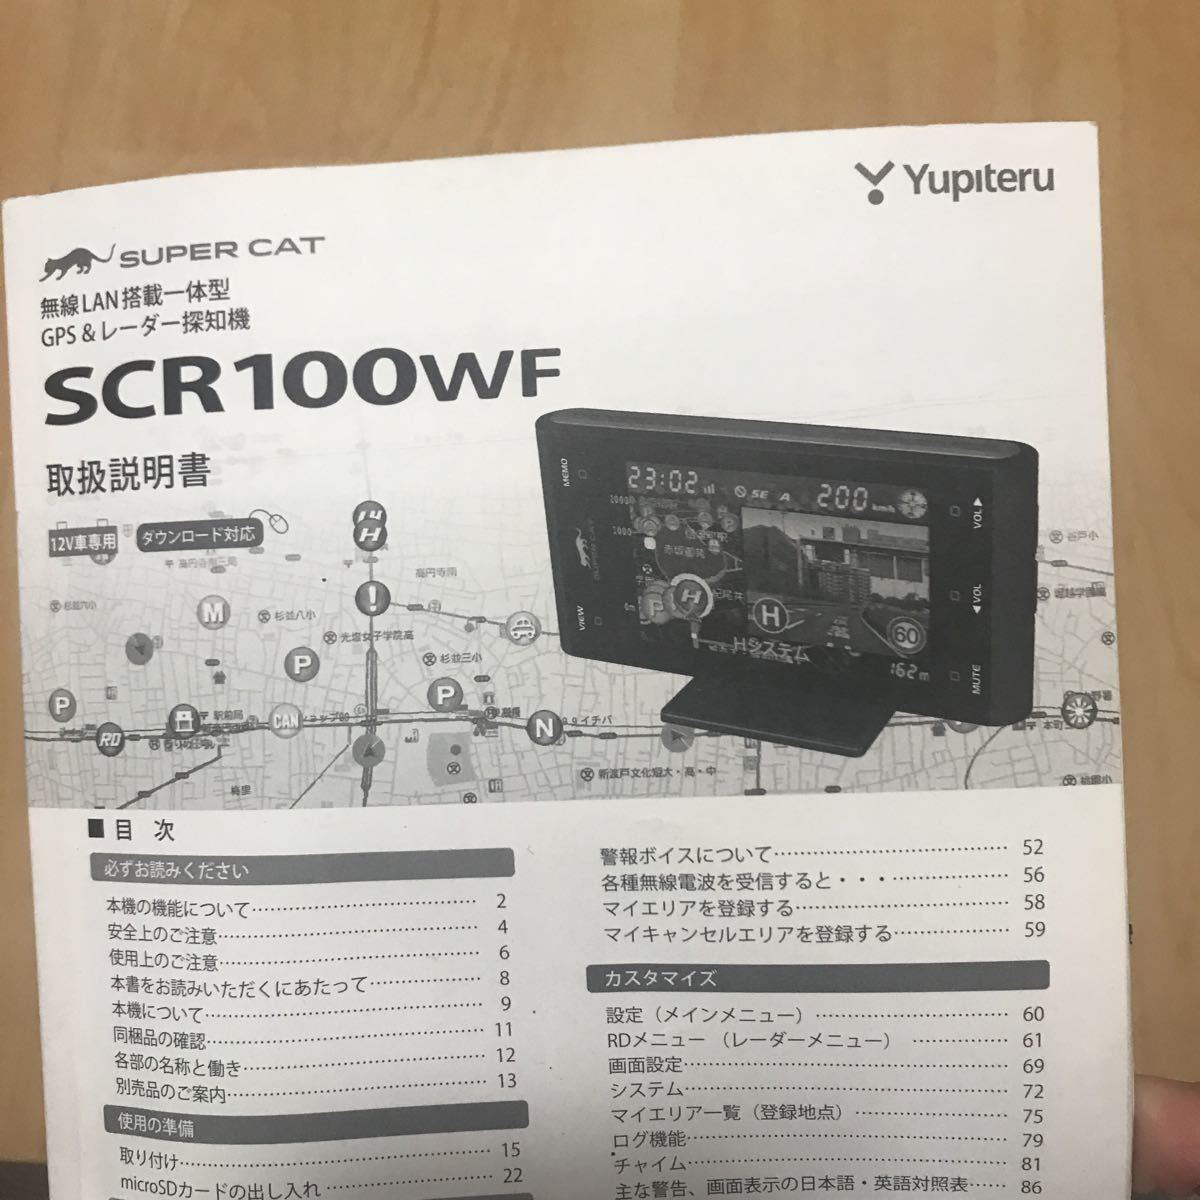 YUPITERU ユピテル スーパーキャット レーダー探知機 取扱説明書/SCR100WF/中古品送料込_画像2